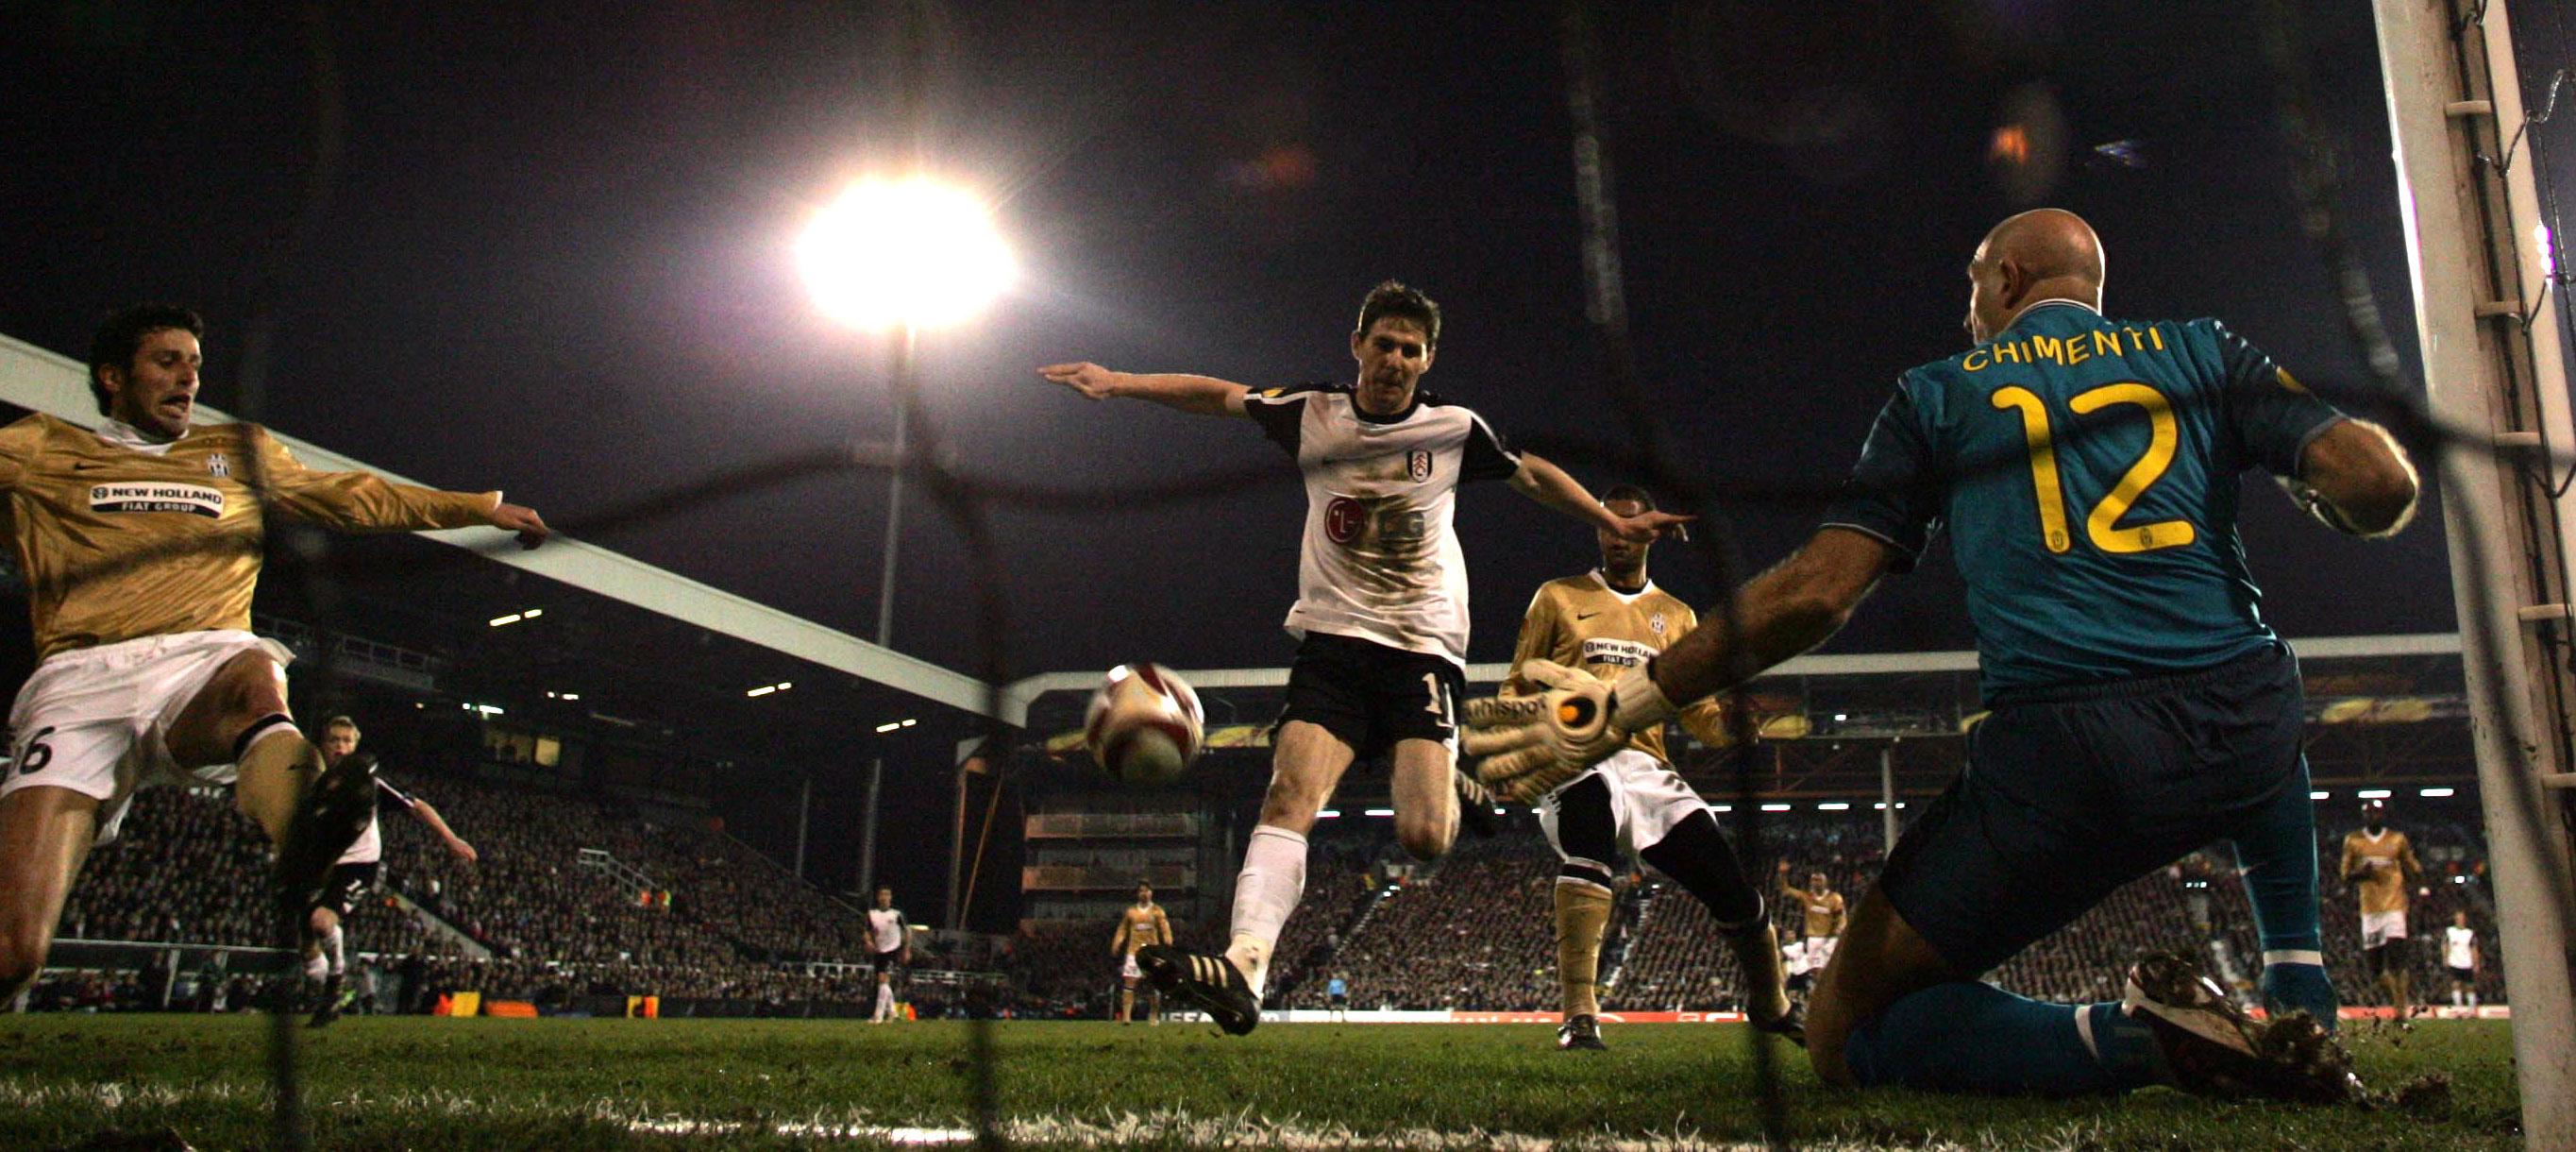 El Fulham venciendo a la Juventus